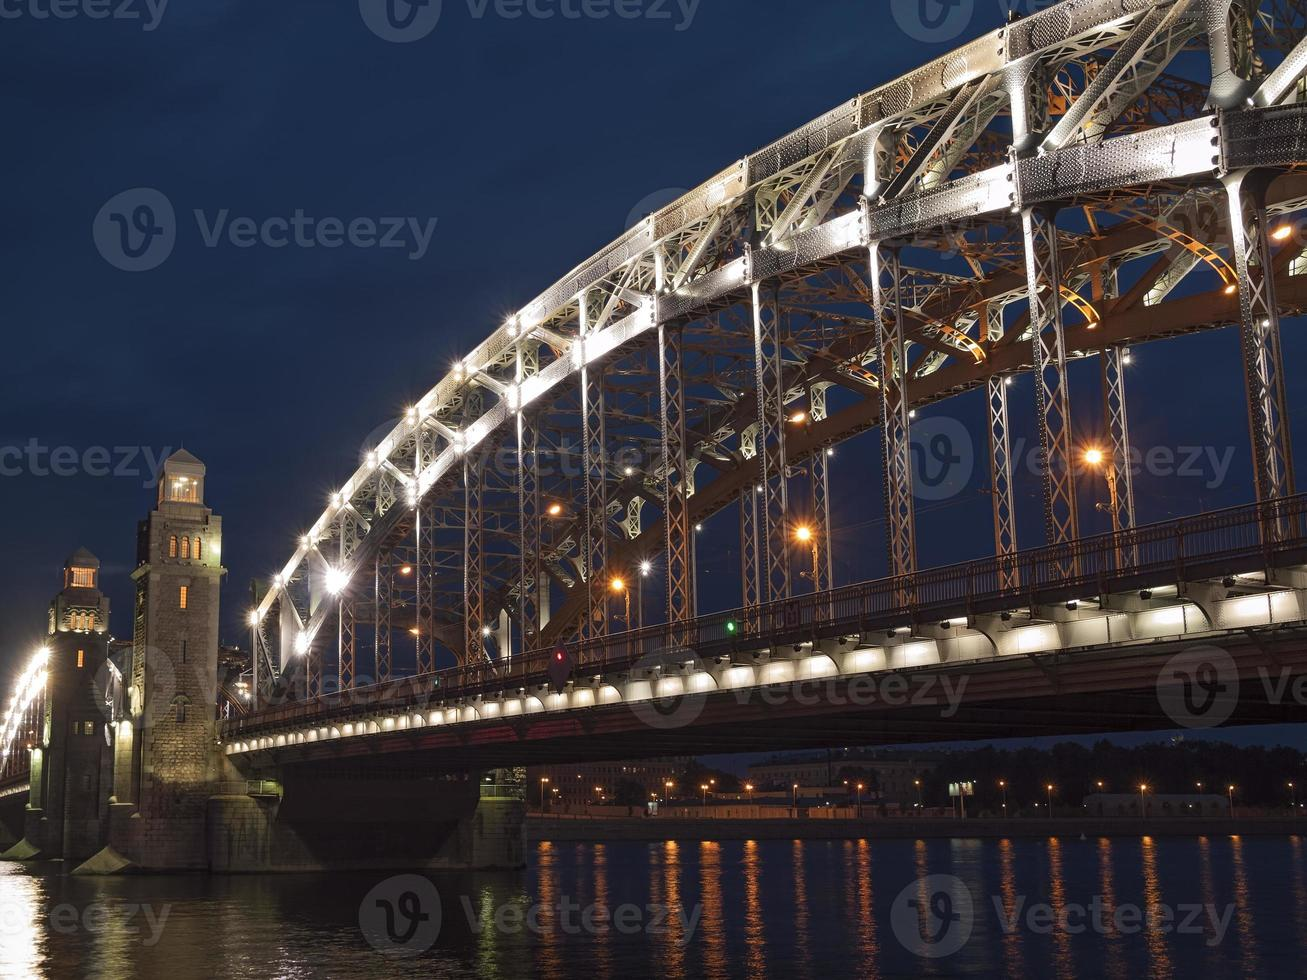 Evening Saint-Petersburg photo